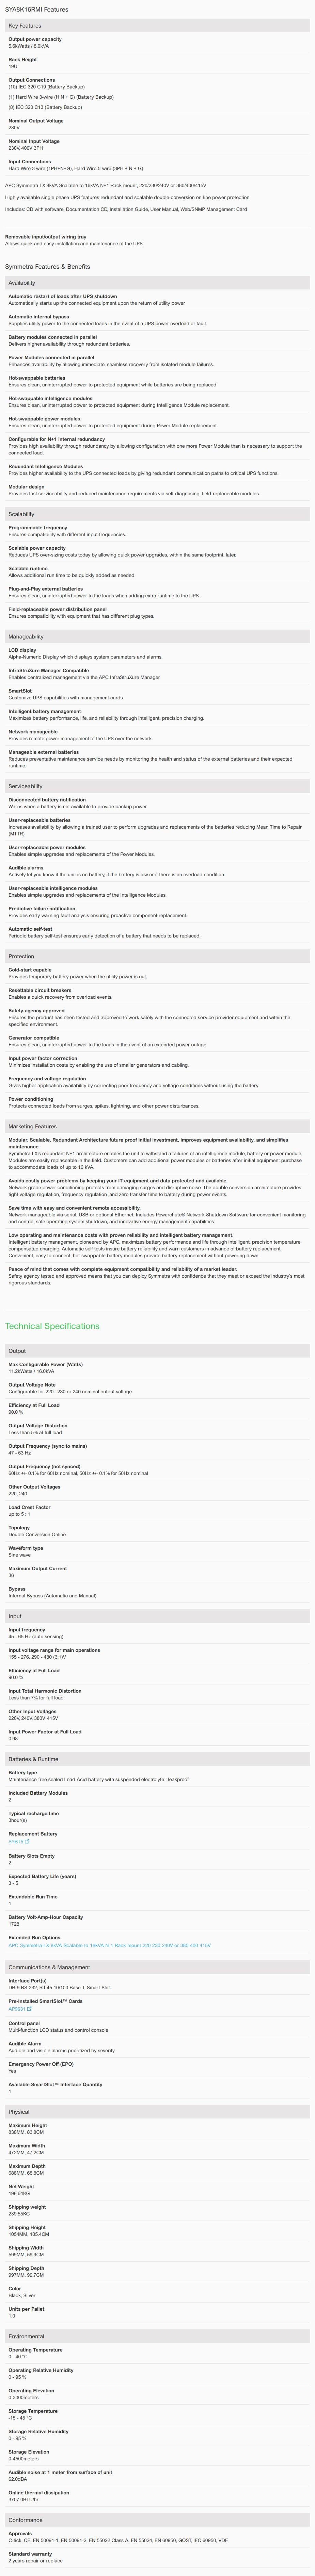 APC Symmetra LX 8KVA/16kVA 240/415V Rackmount UPS - Overview 1